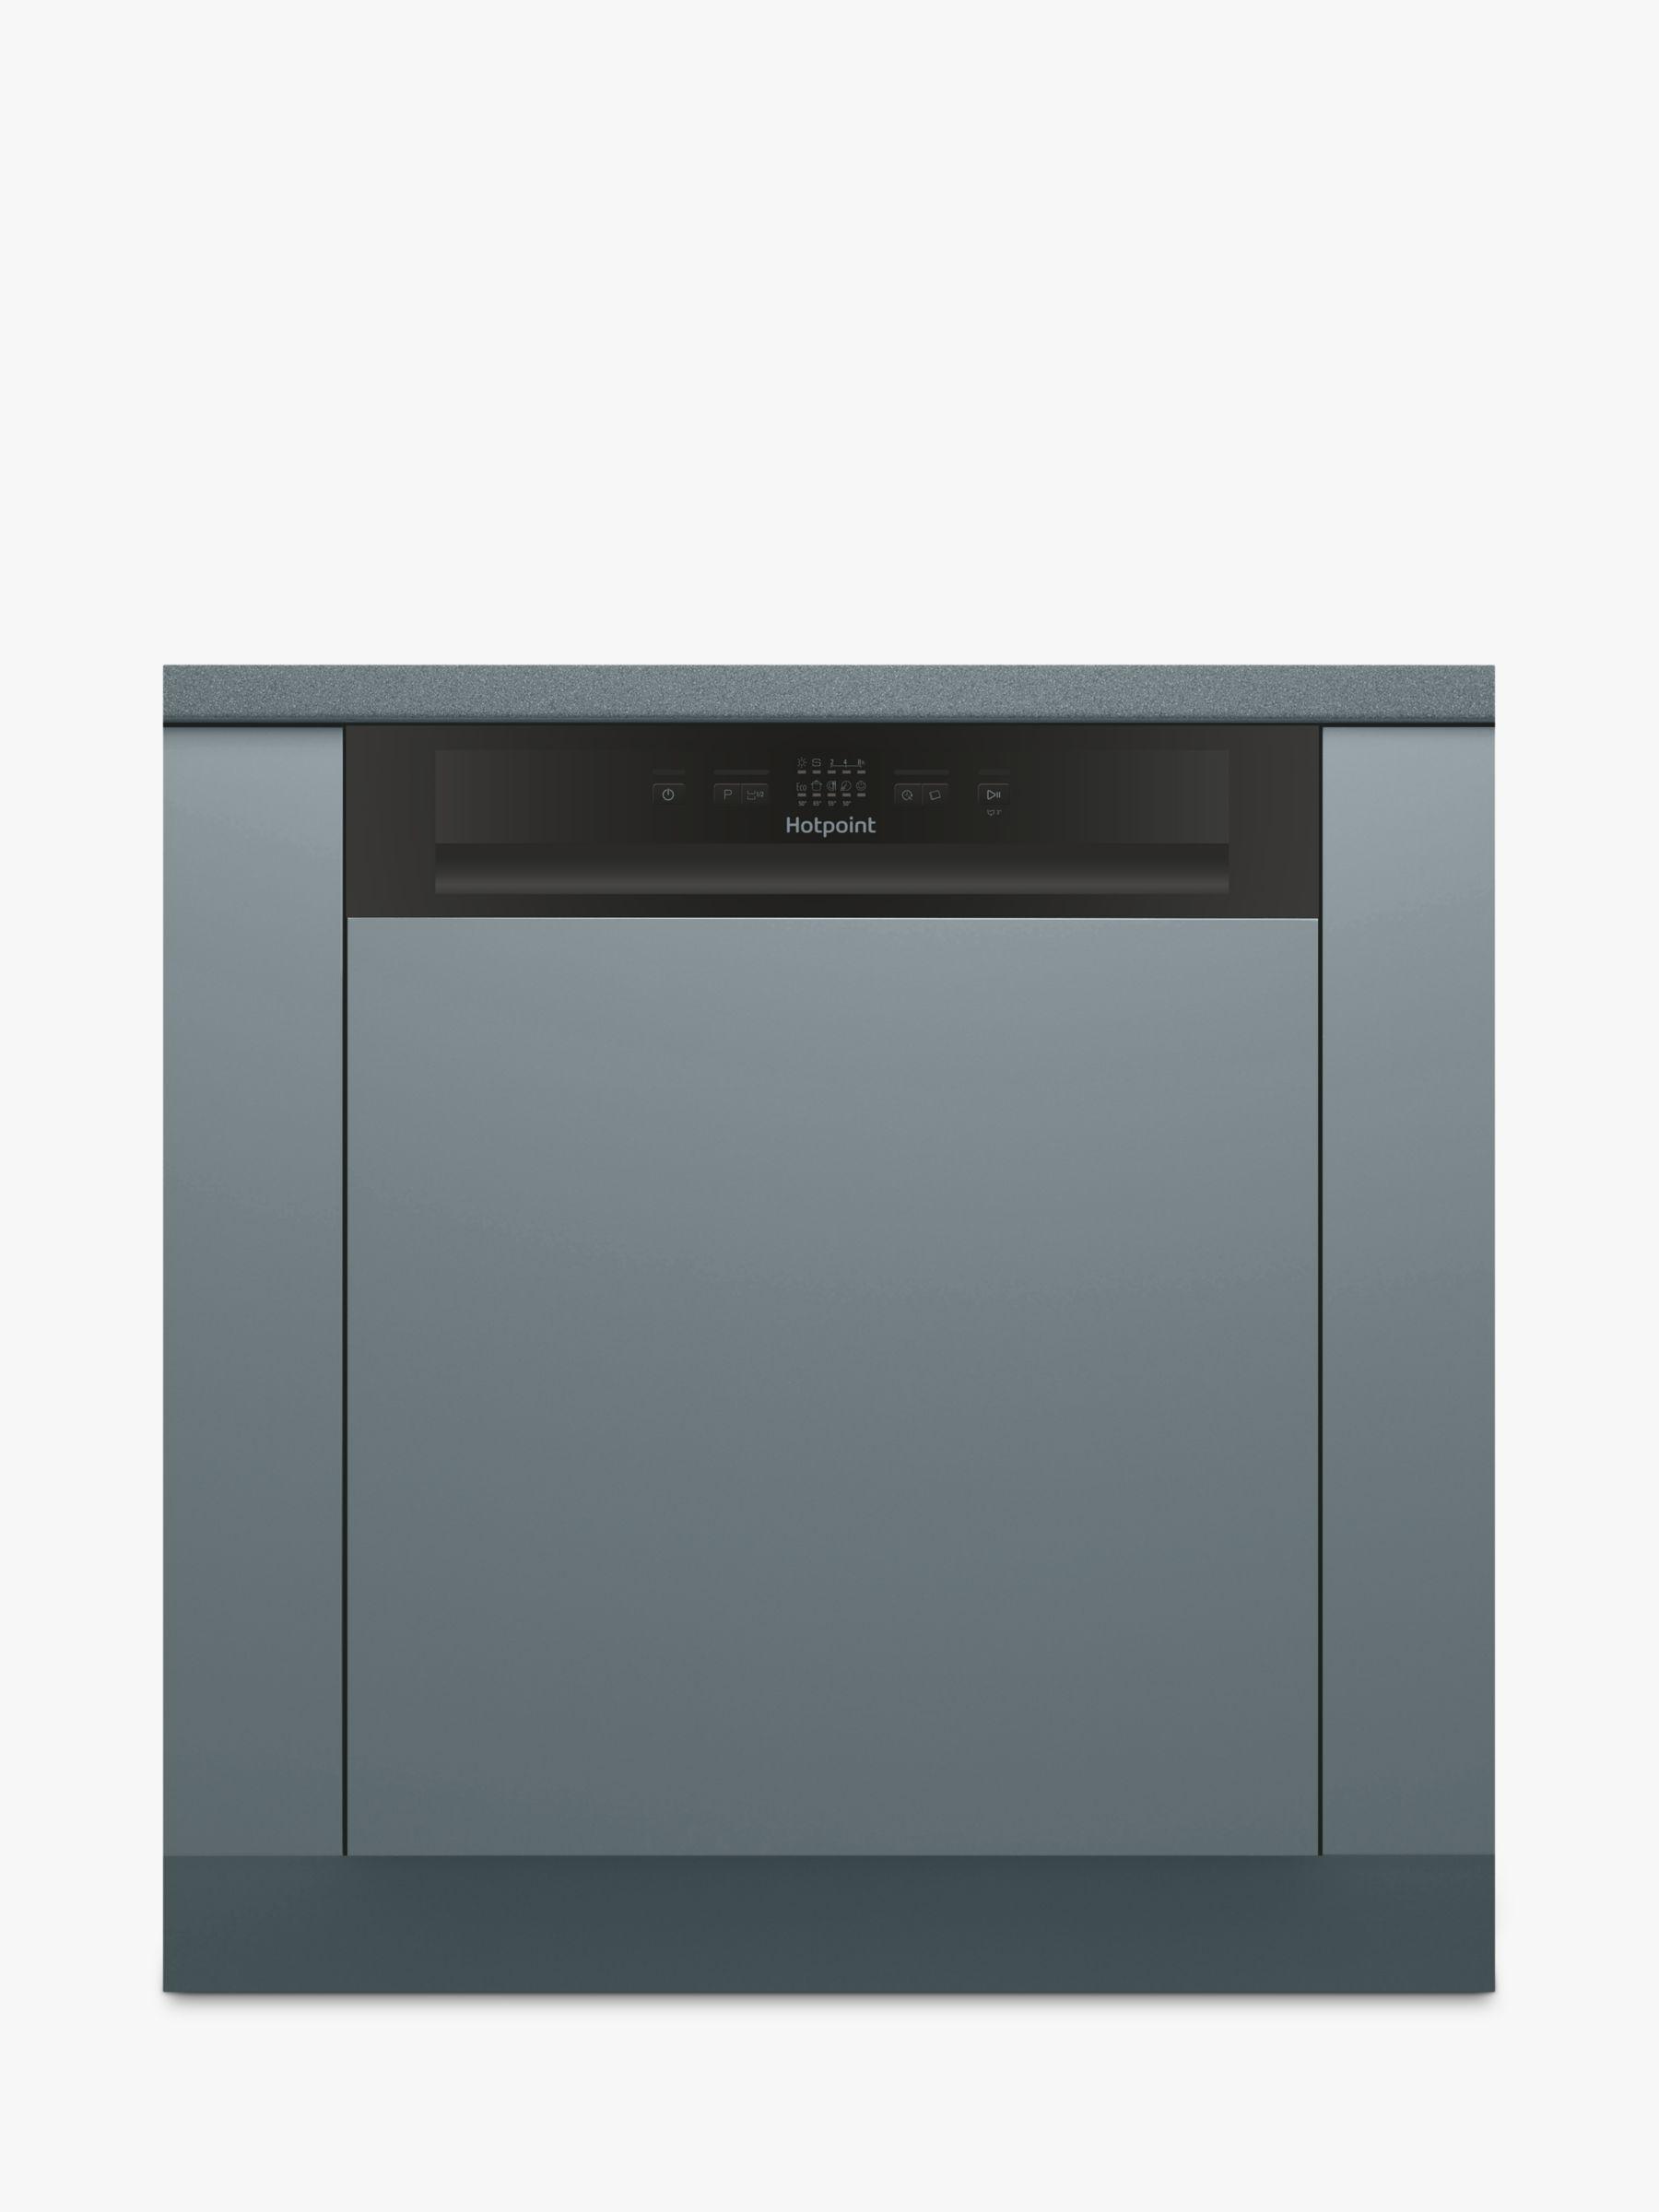 Hotpoint Hotpoint HBC 2B19 Semi-integrated Dishwasher, Black